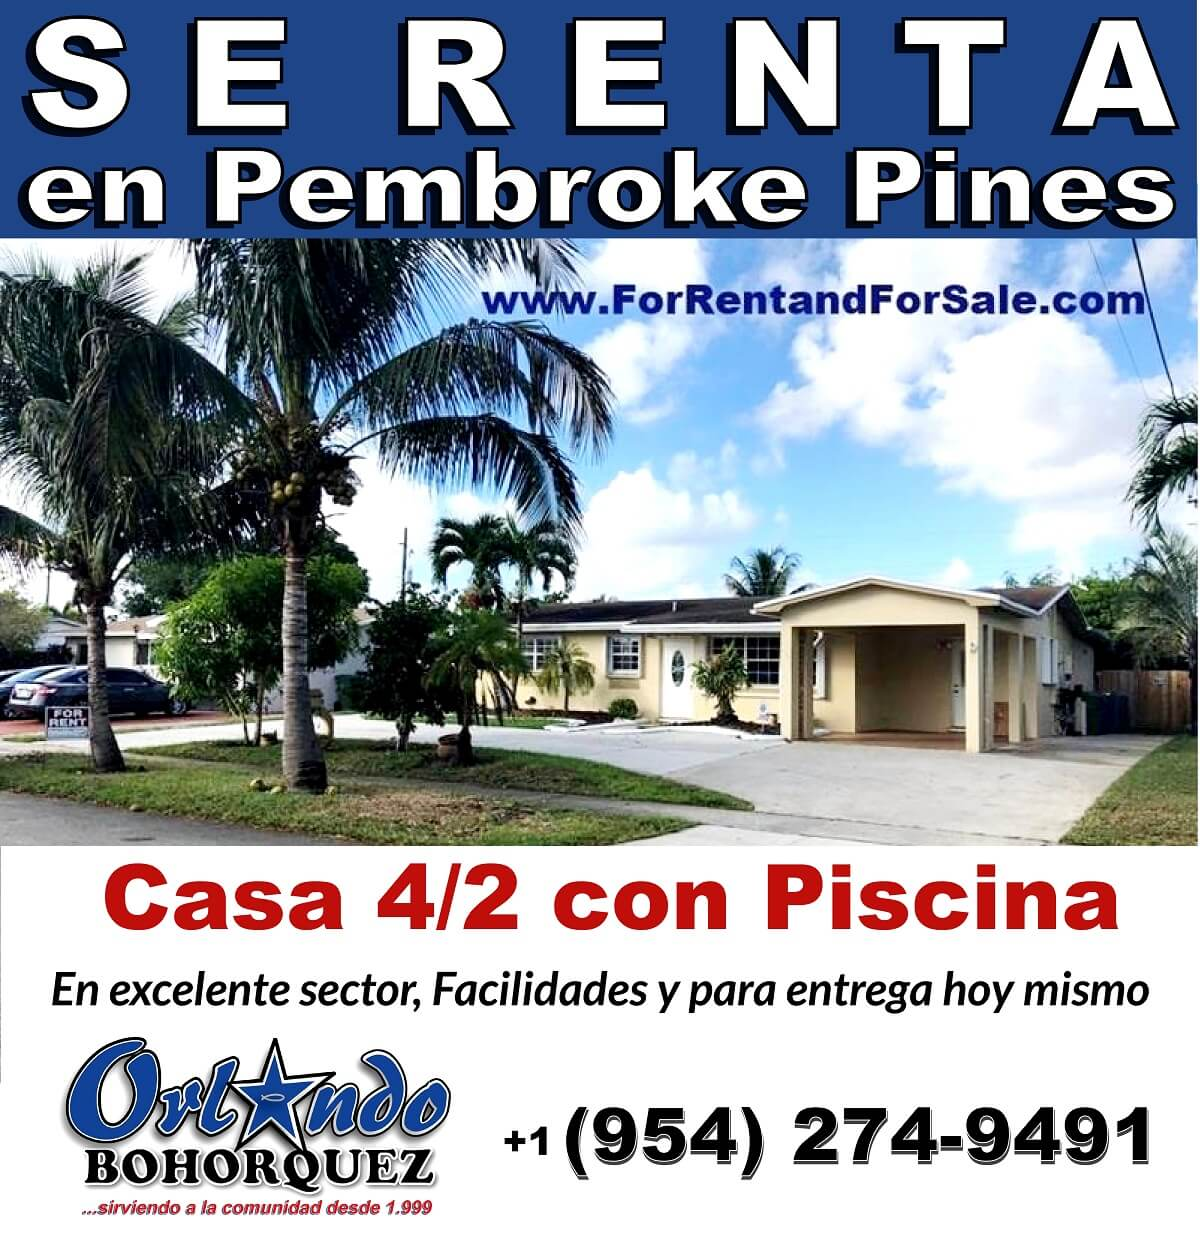 CASA EN RENTA, PEMBROKE PINES-FLORIDA